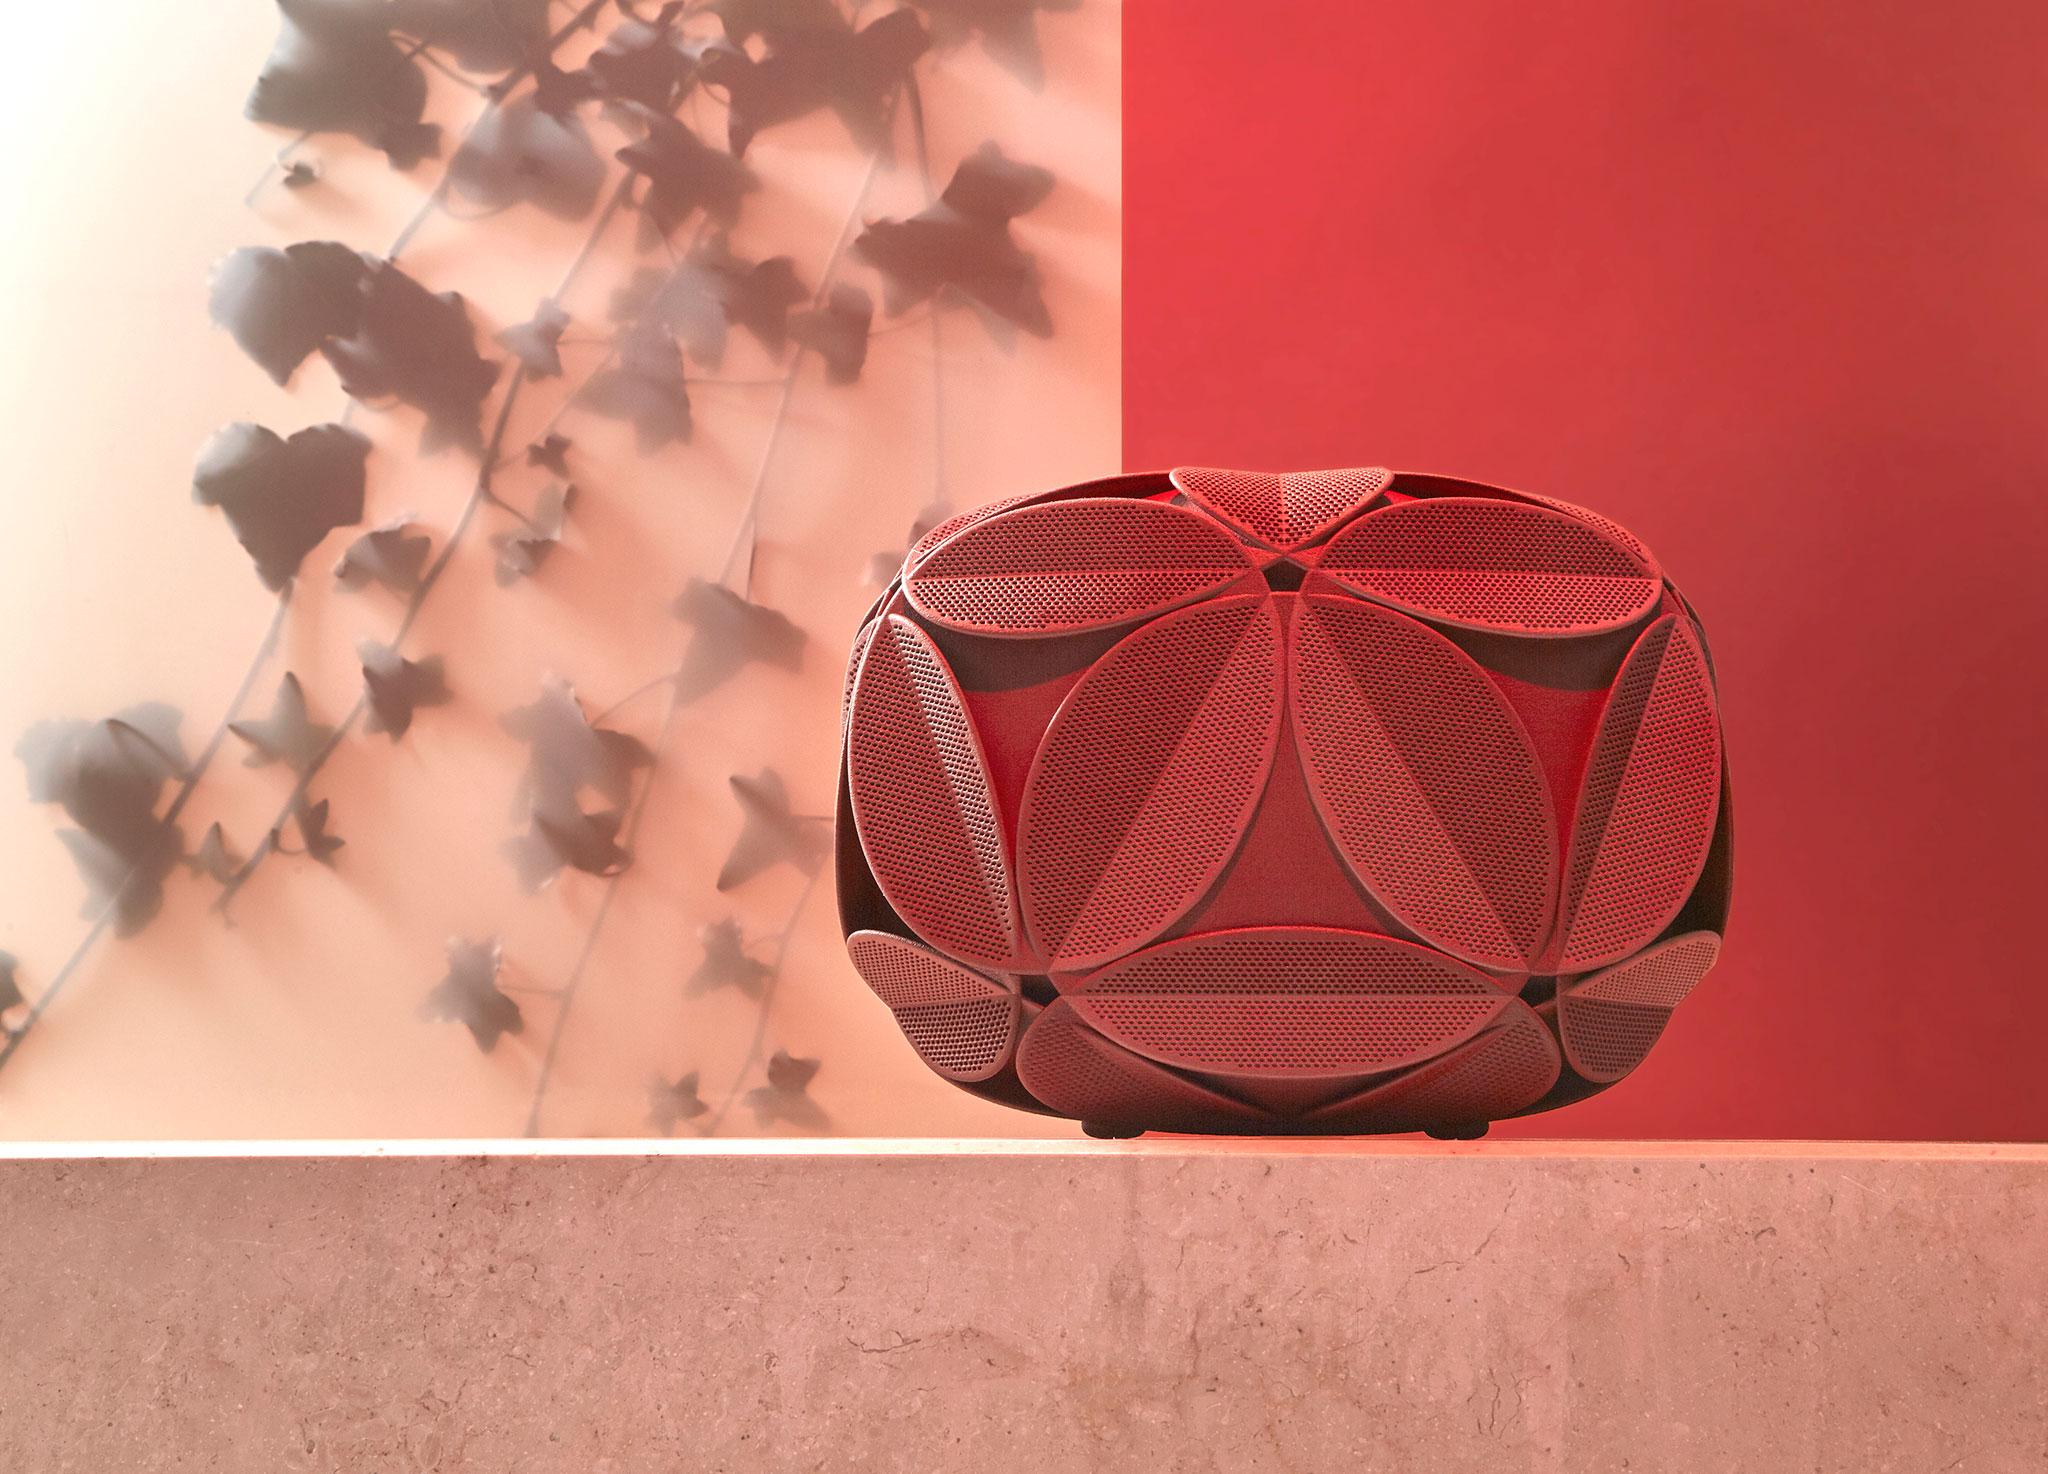 Ivy-3D-Printed-Clutch-Maison-203-03